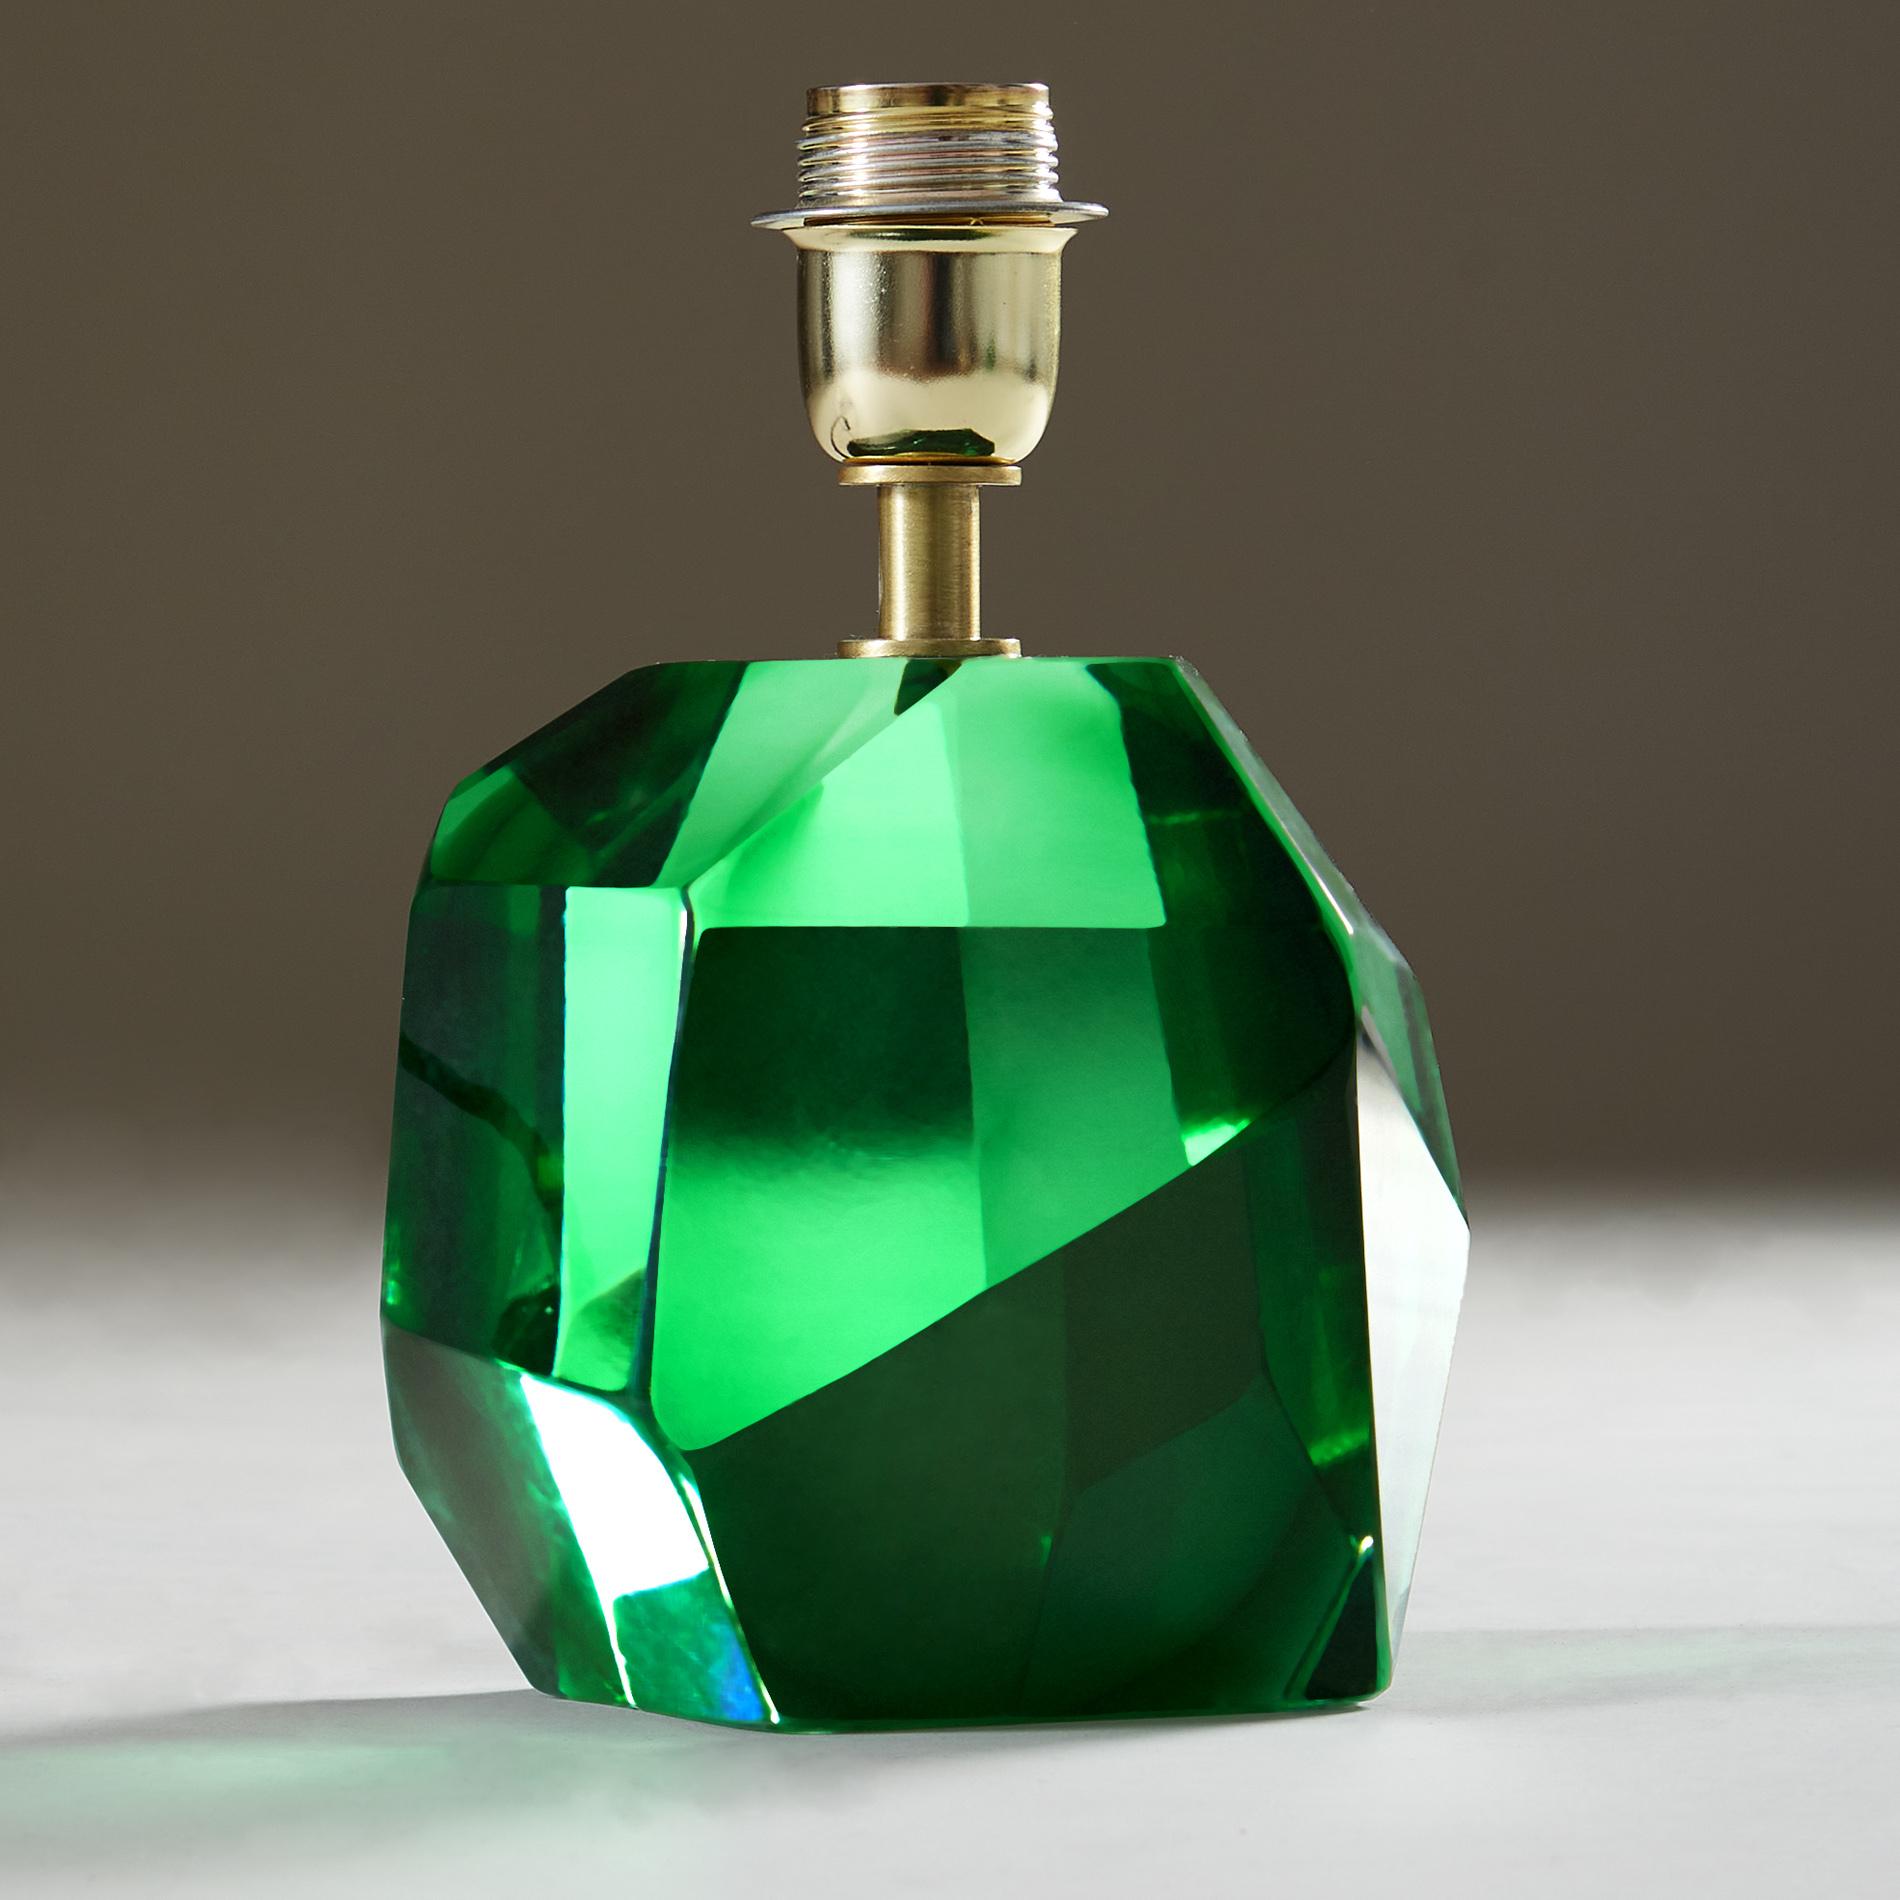 Emerald Green Rock Lamp 20210225 Valerie Wade 2 221 V1